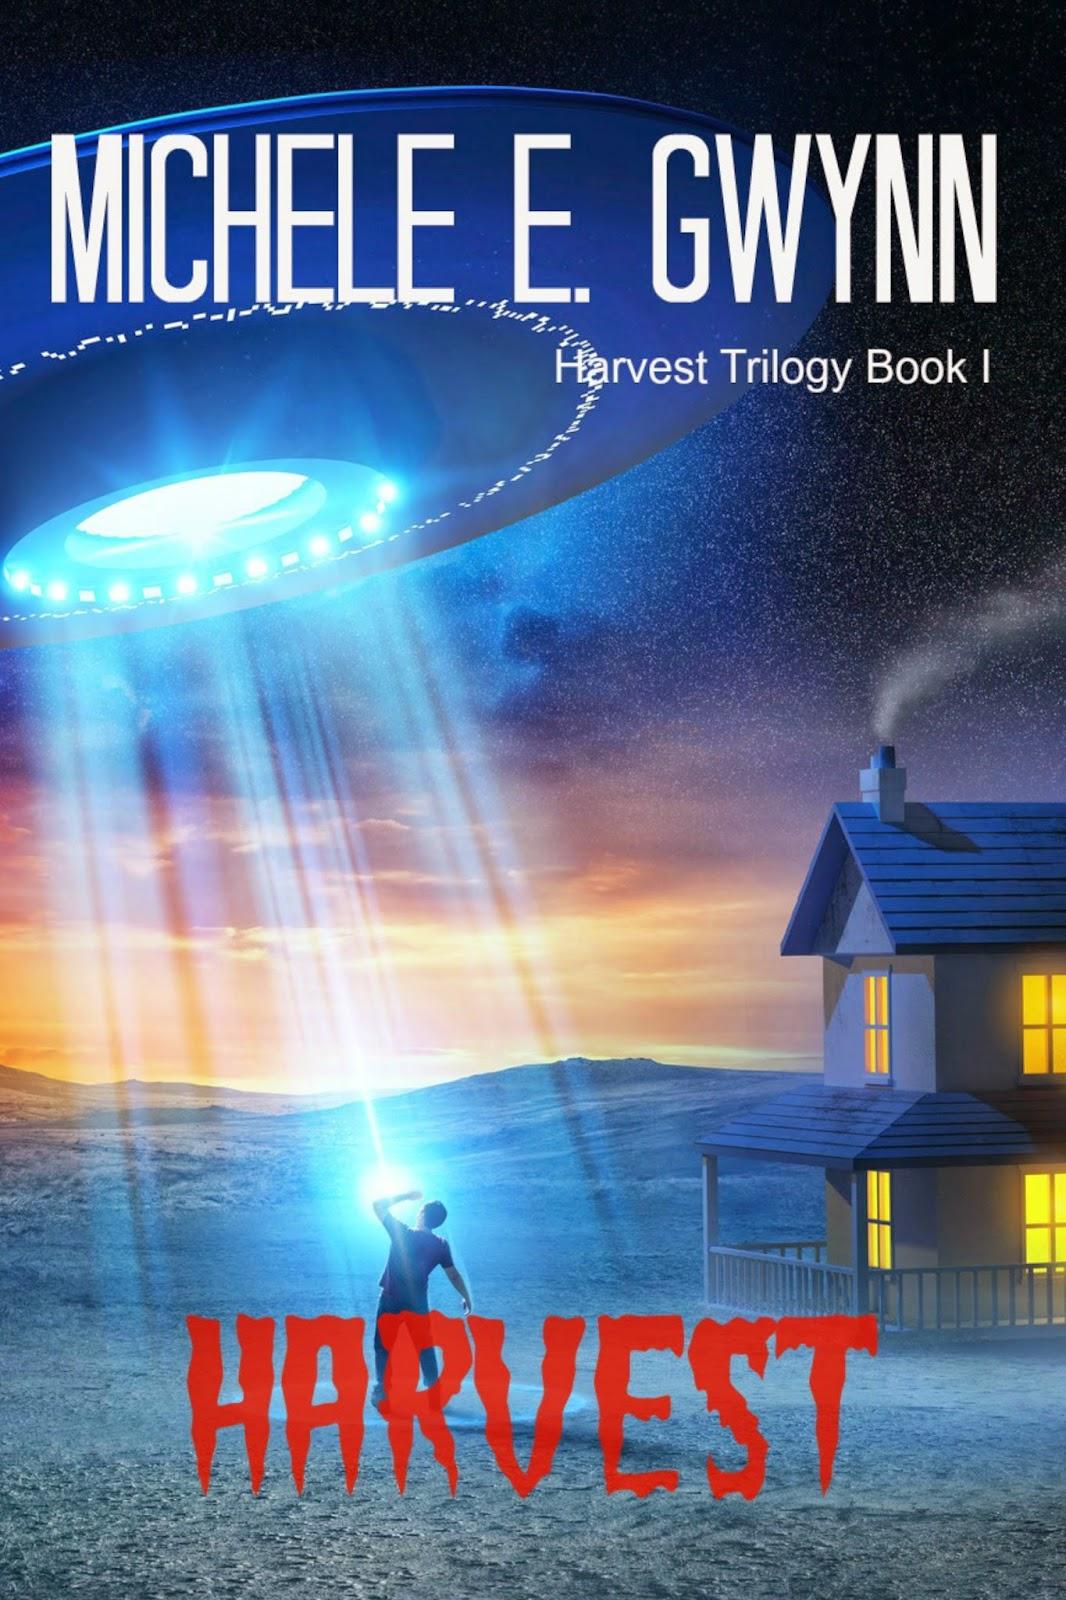 http://www.amazon.com/Harvest-Trilogy-Book-1-ebook/dp/B006EXBVVE/ref=sr_1_4_twi_1_kin?ie=UTF8&qid=1428132362&sr=8-4&keywords=MICHELE+GWYNN